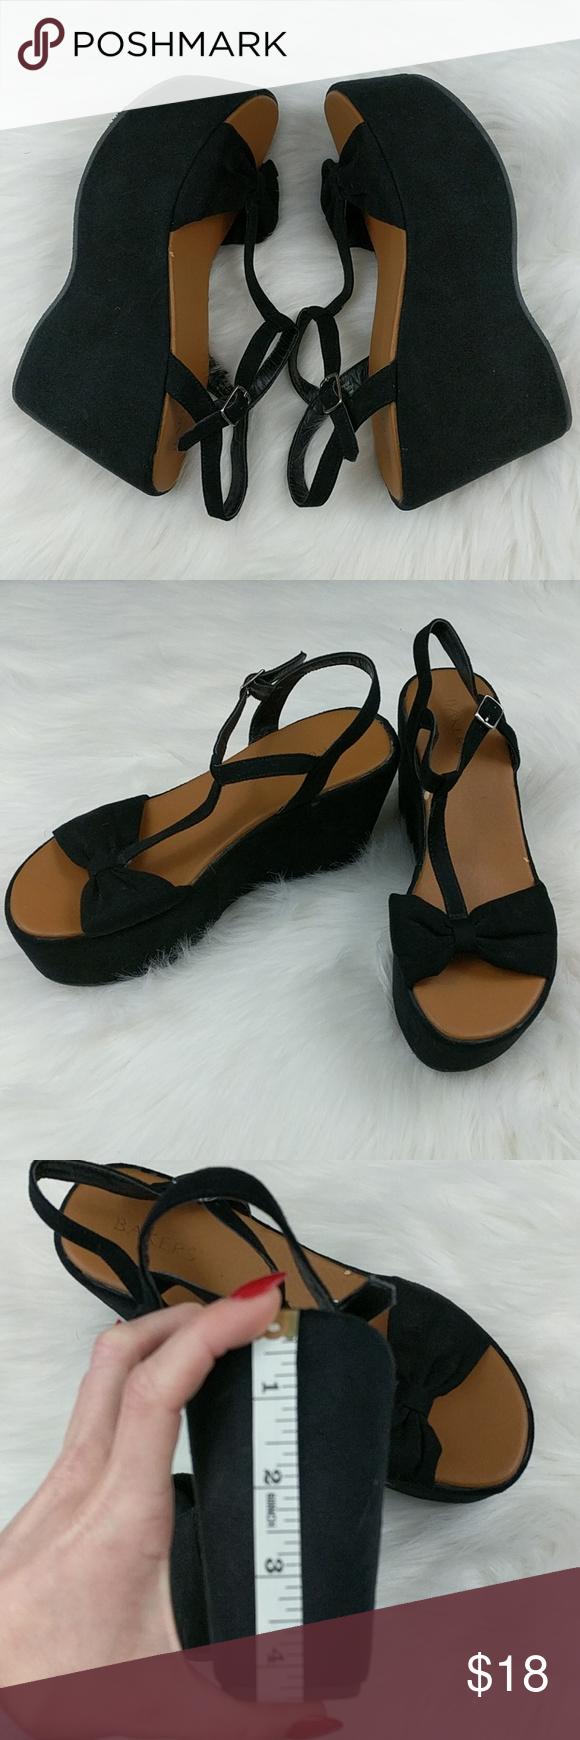 11ee545cf5 Faux suede platform wedge sandals bow tie Size 10 4.5 inches heel Bakers  brand resort platform